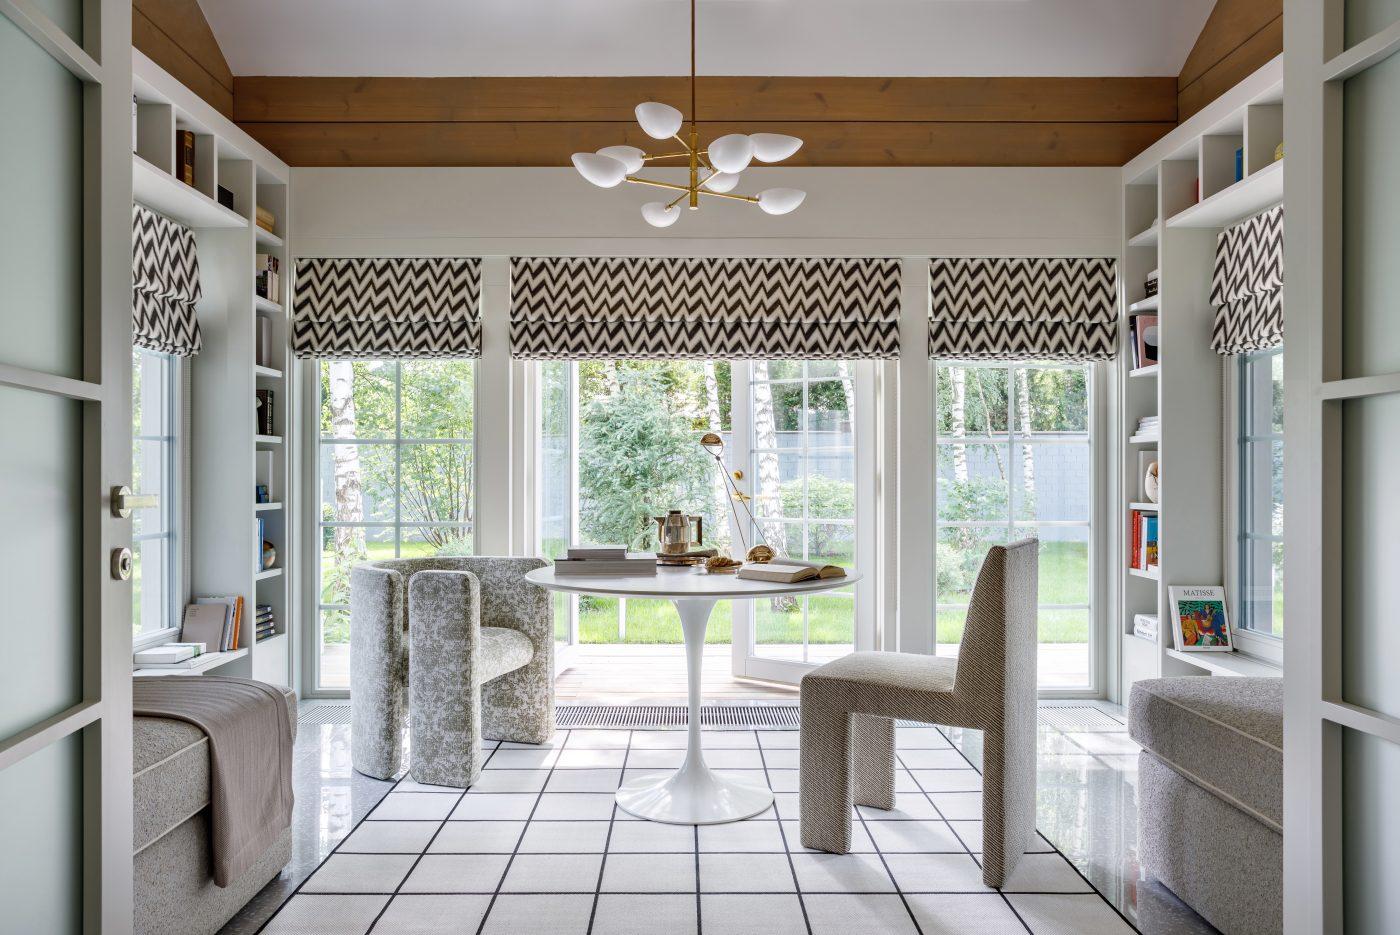 Family room designed by Malyeva